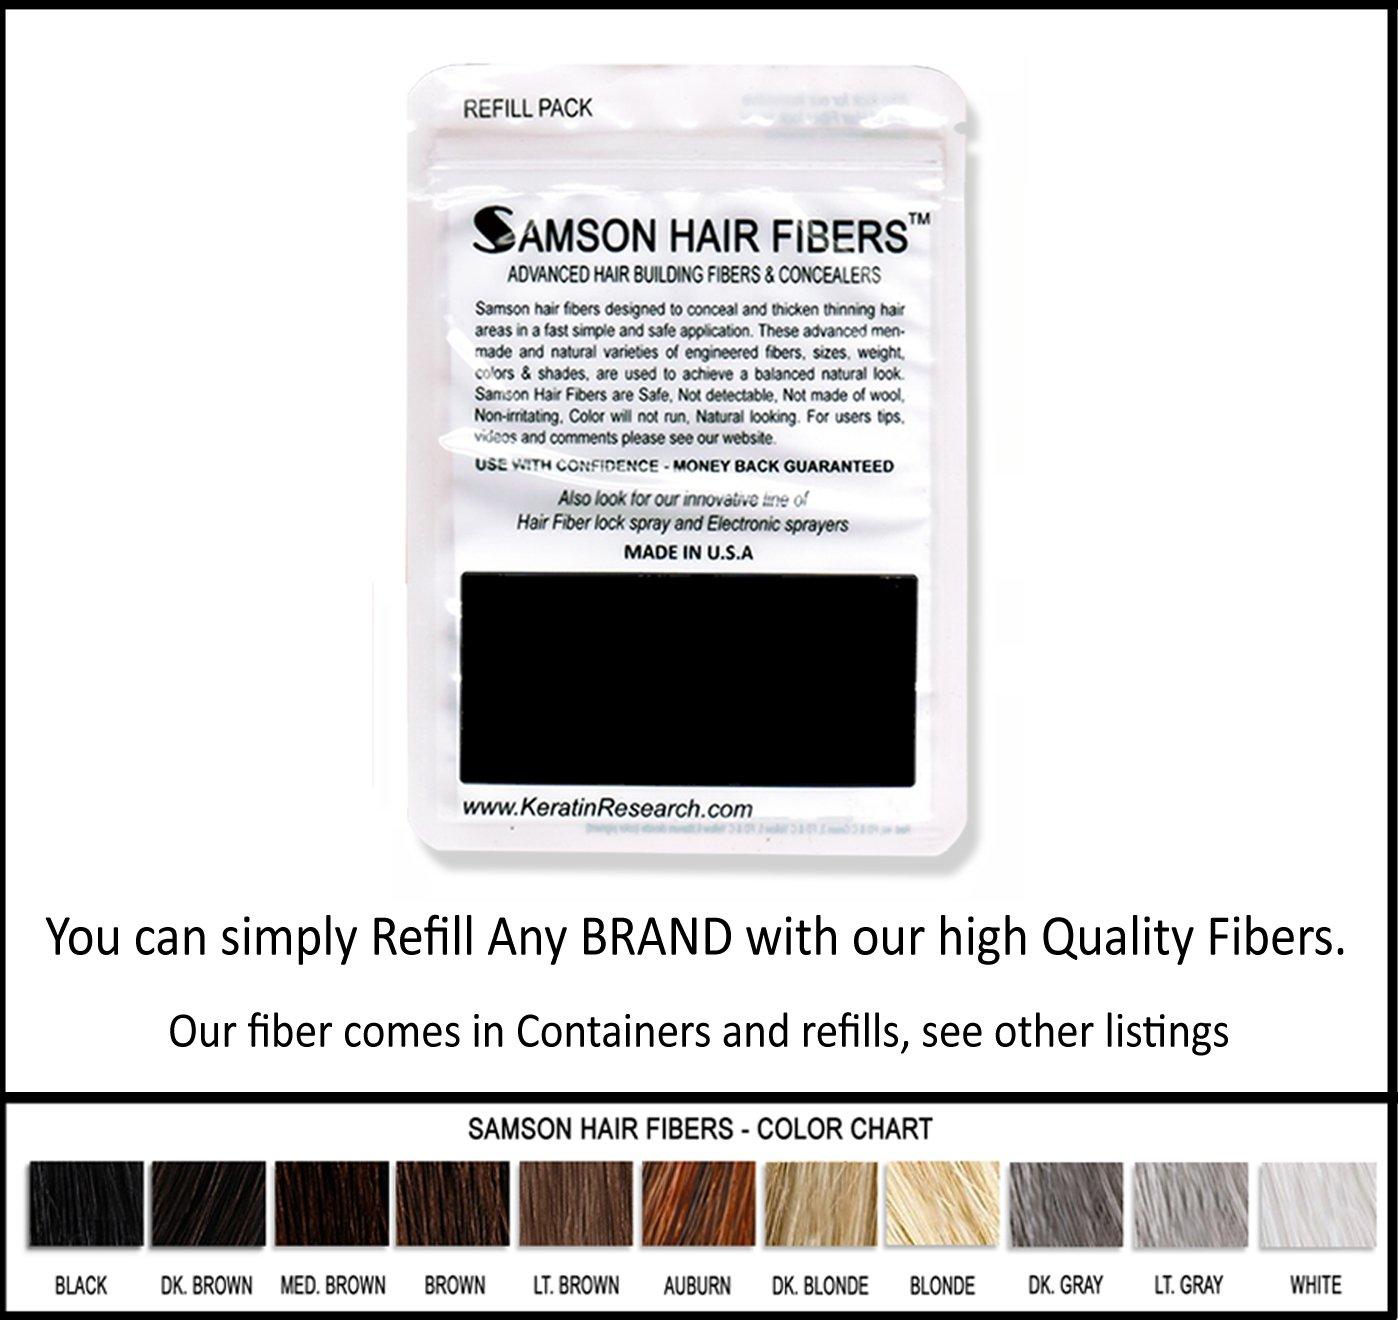 BLACK Hair Fiber Refill kit By Samson Large 25 Grams Made in USA Hair Loss Concealer Keratin Research Inc